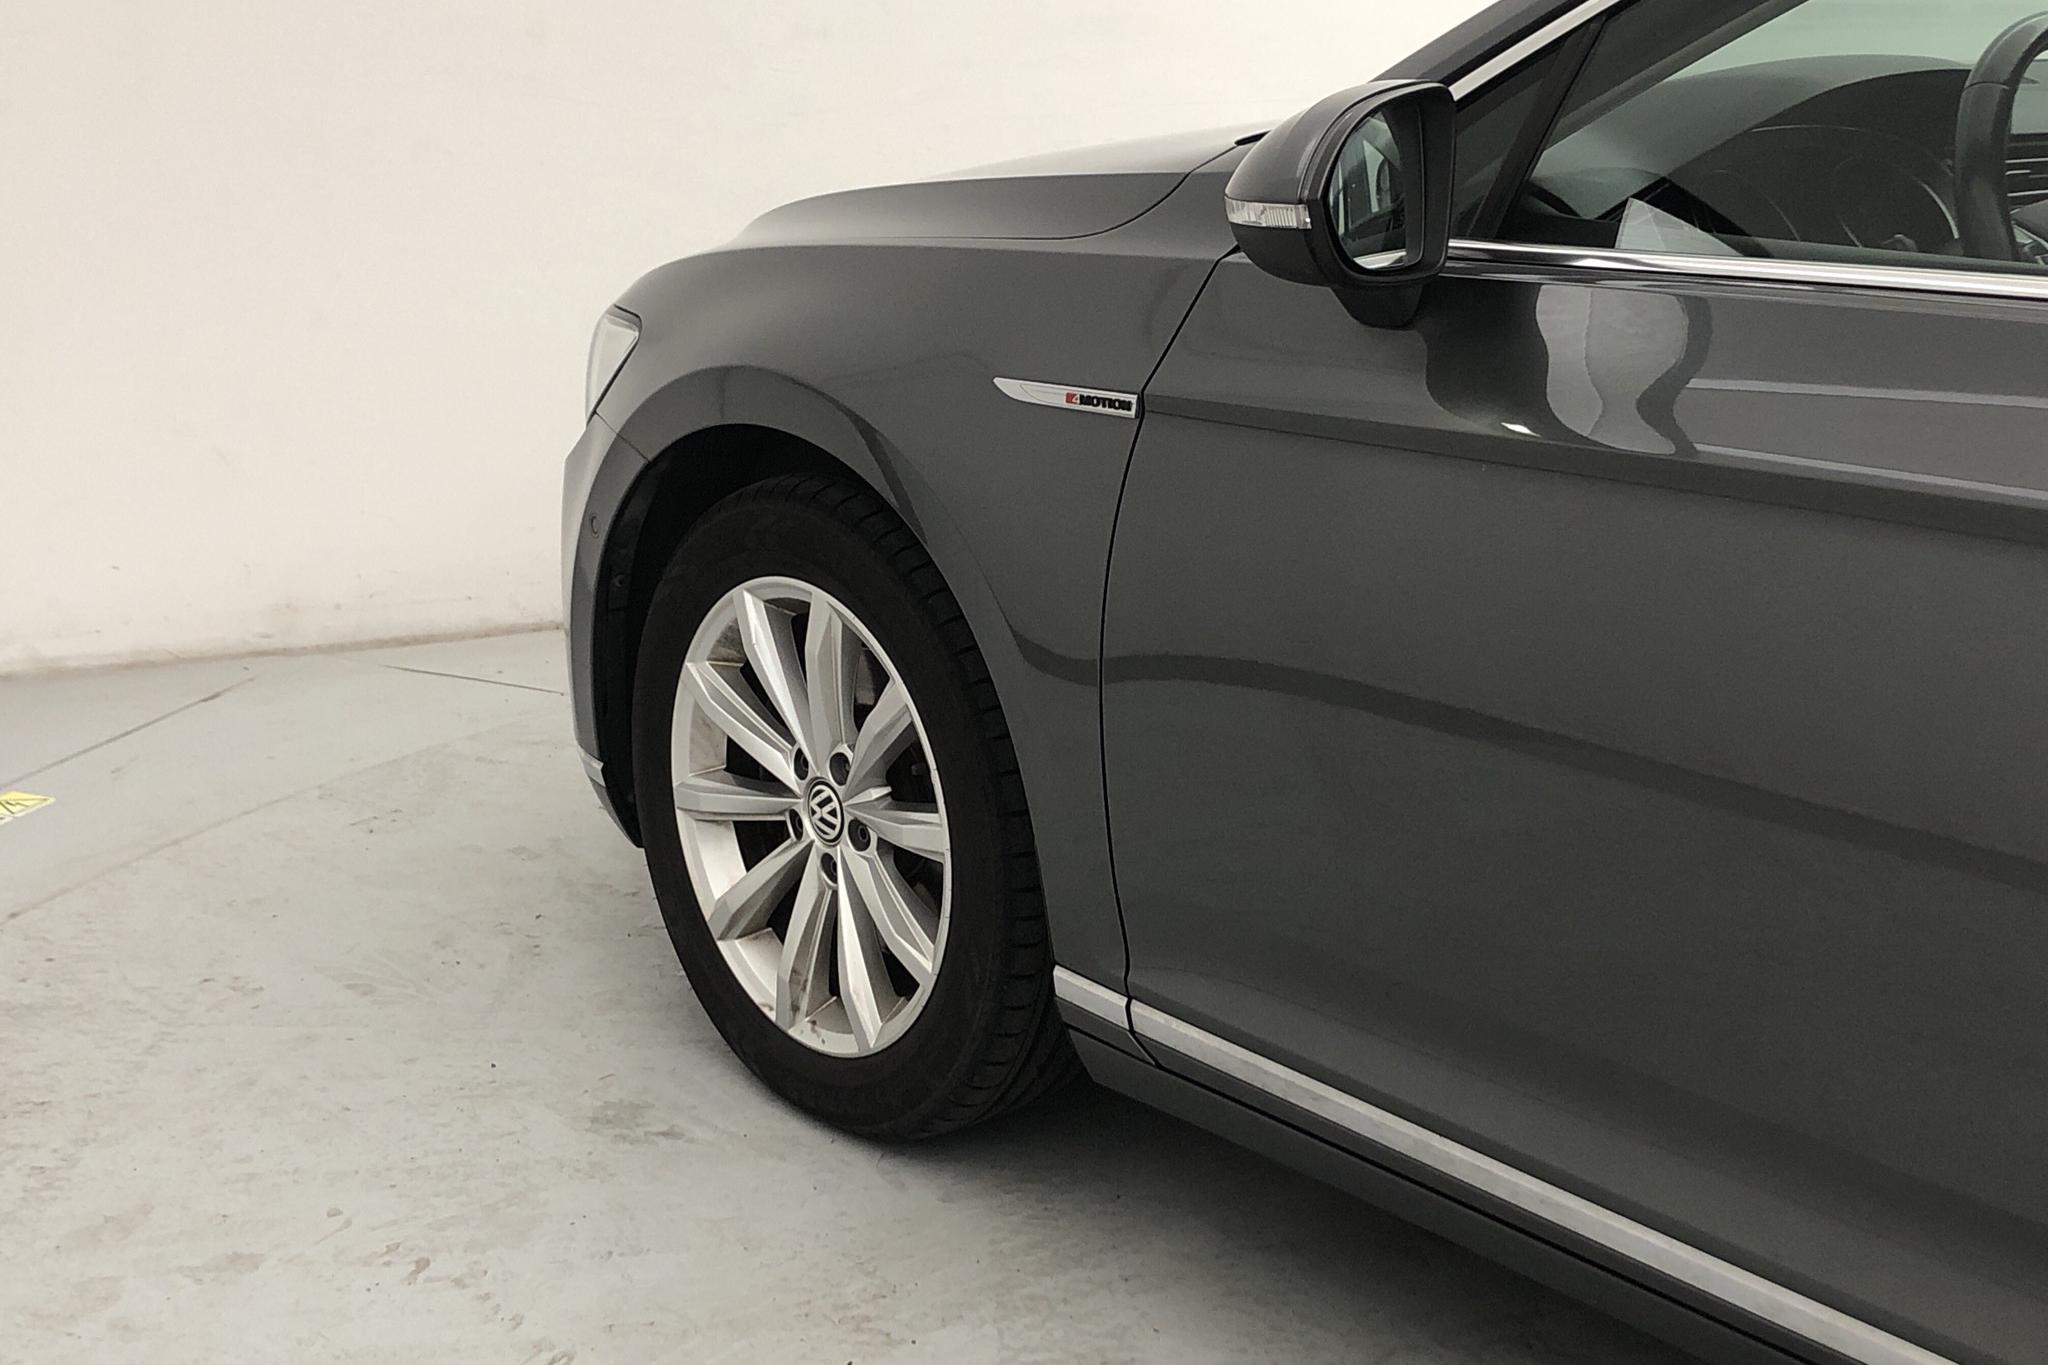 VW Passat 2.0 TDI Sportscombi 4MOTION (190hk) - 97 900 km - Automatic - gray - 2015